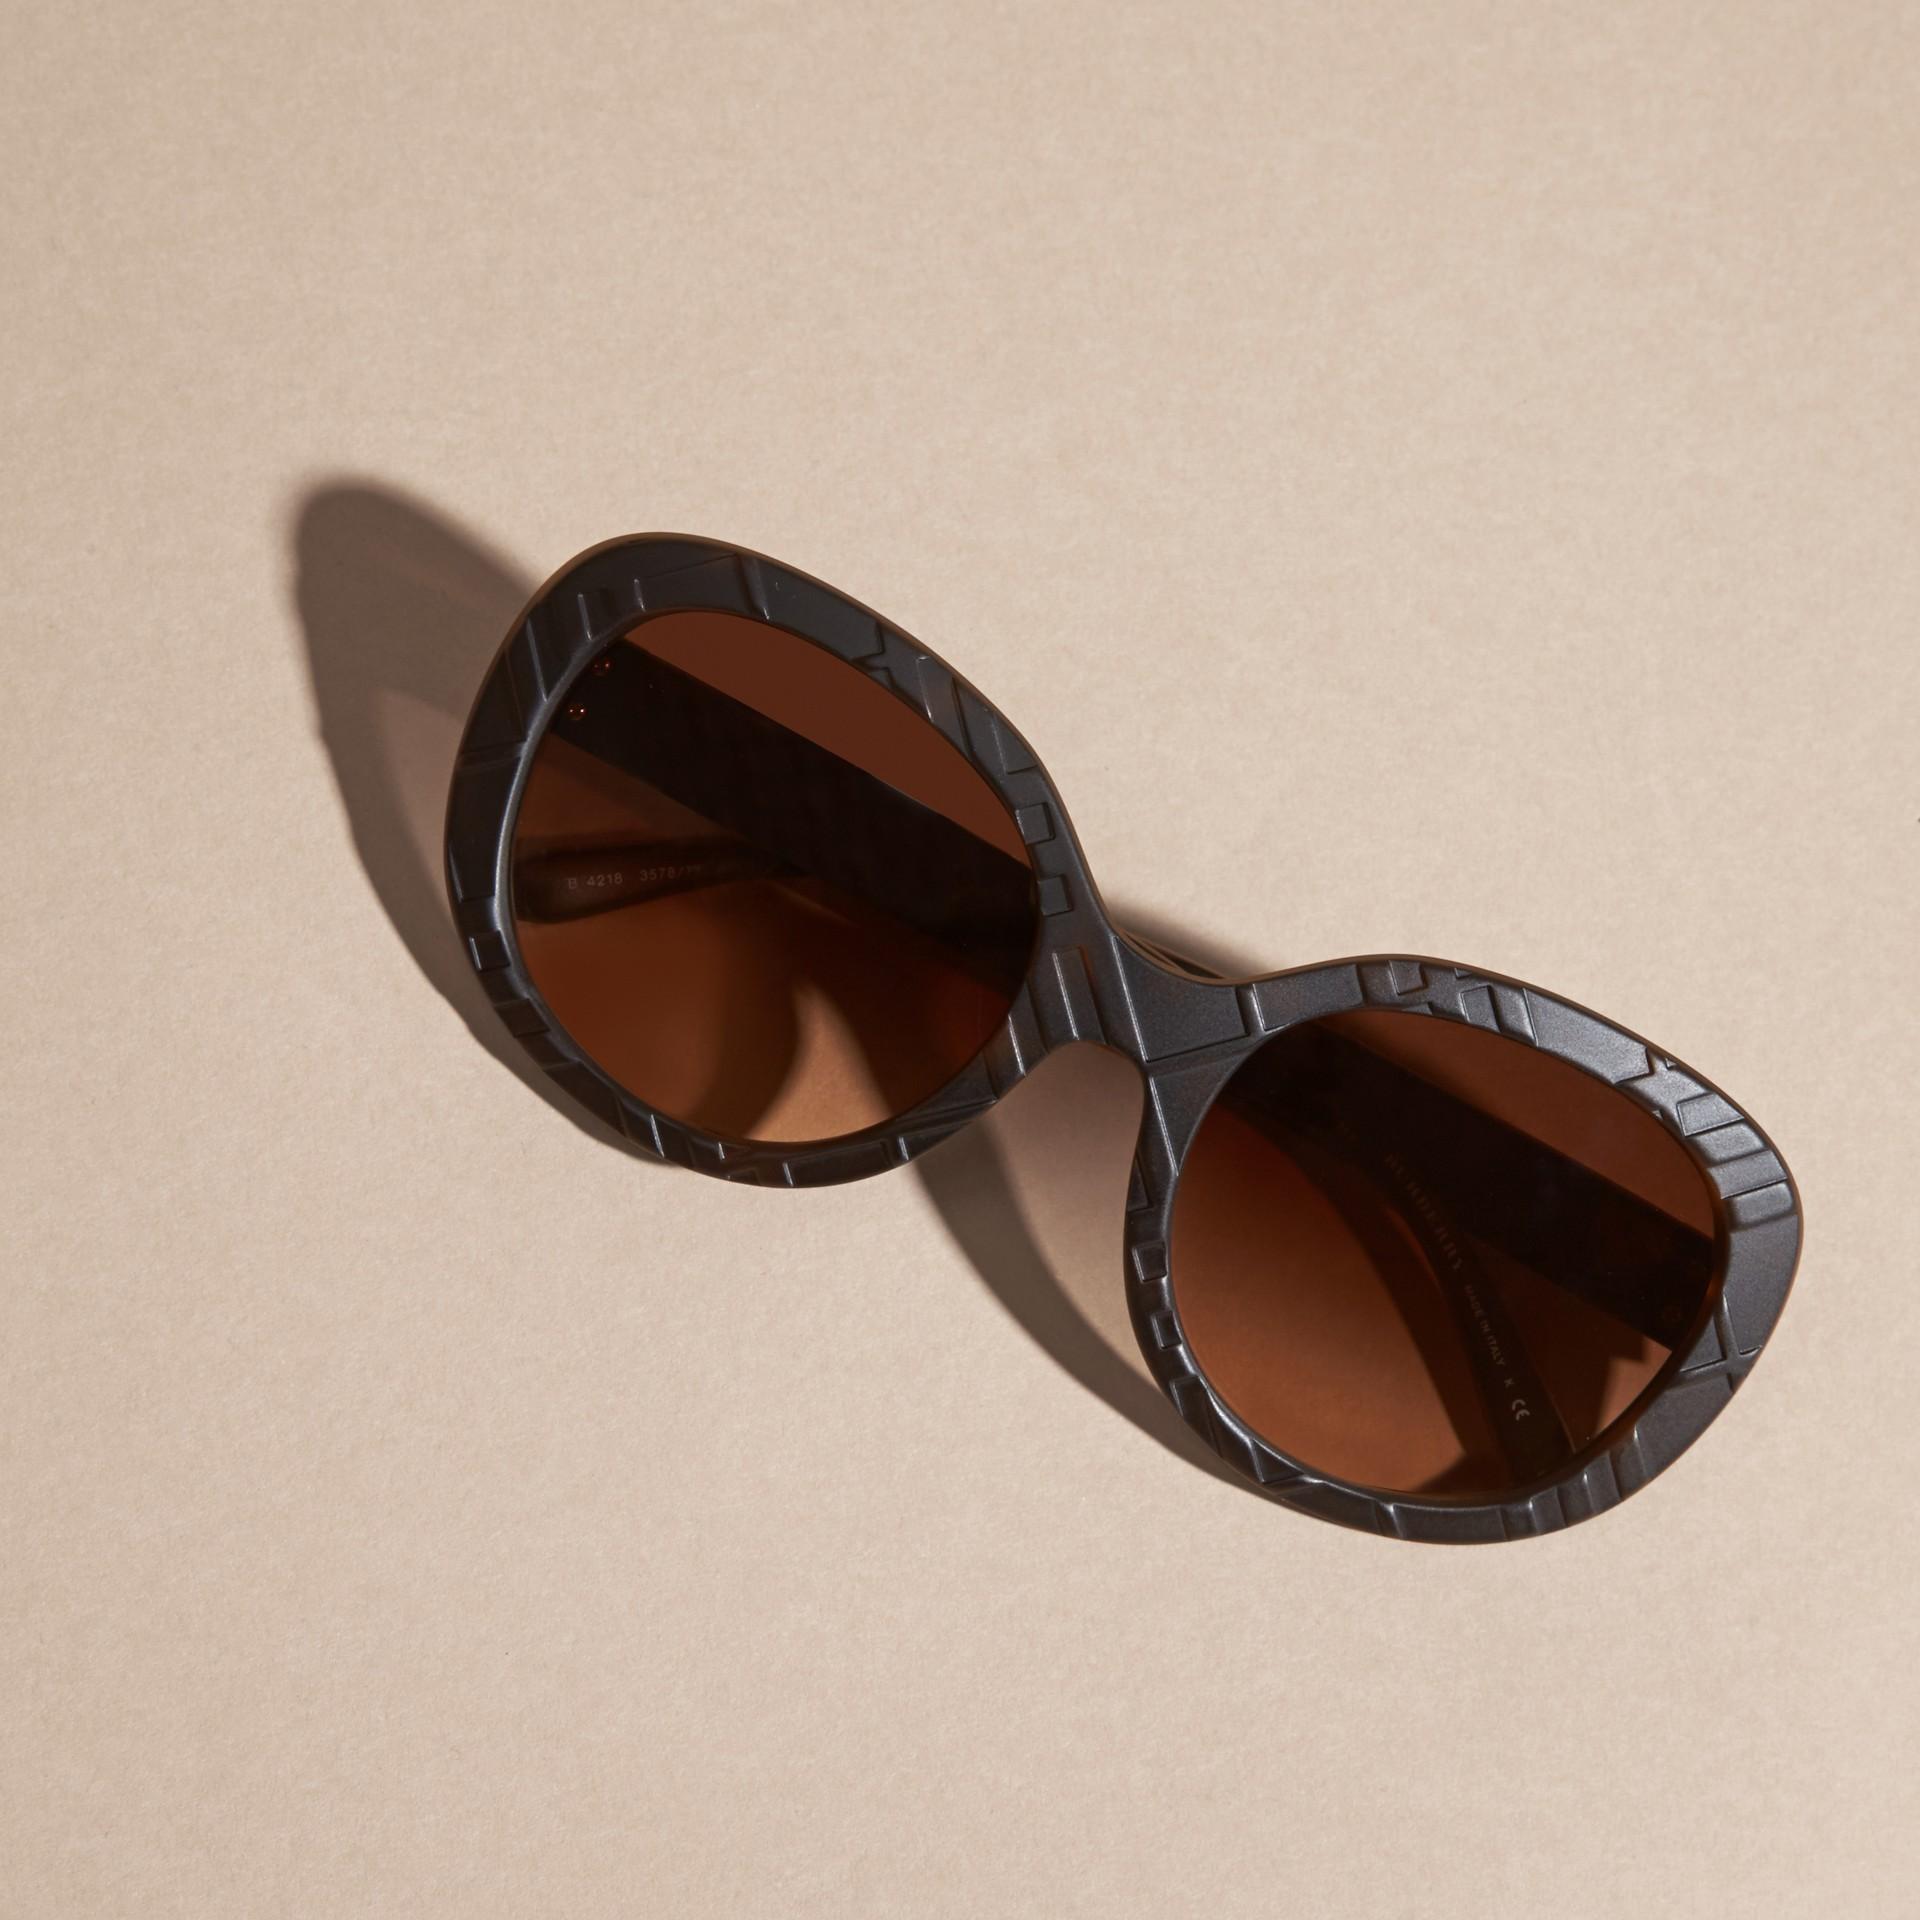 Tortoise shell 3D Check Round Frame Sunglasses Tortoise Shell - gallery image 5